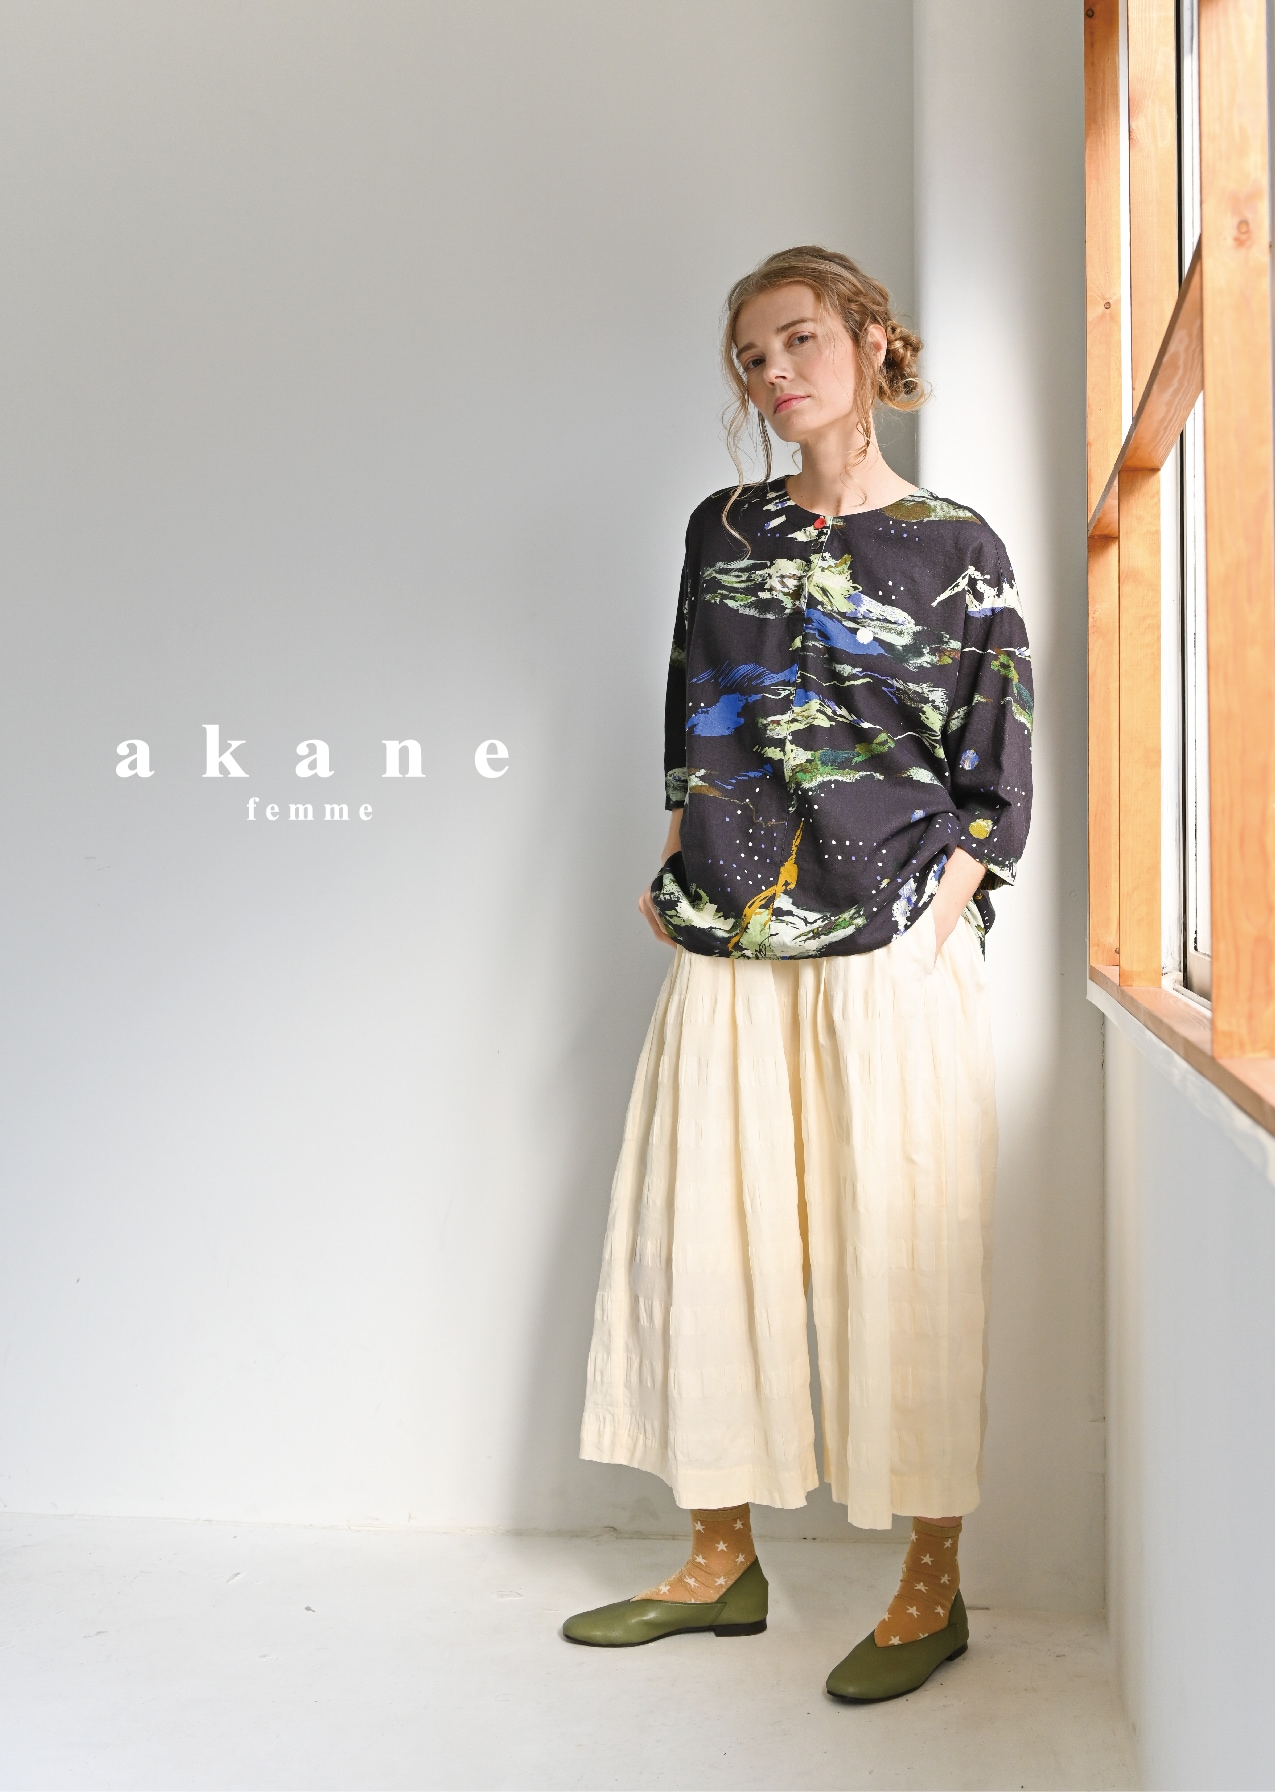 akane femme